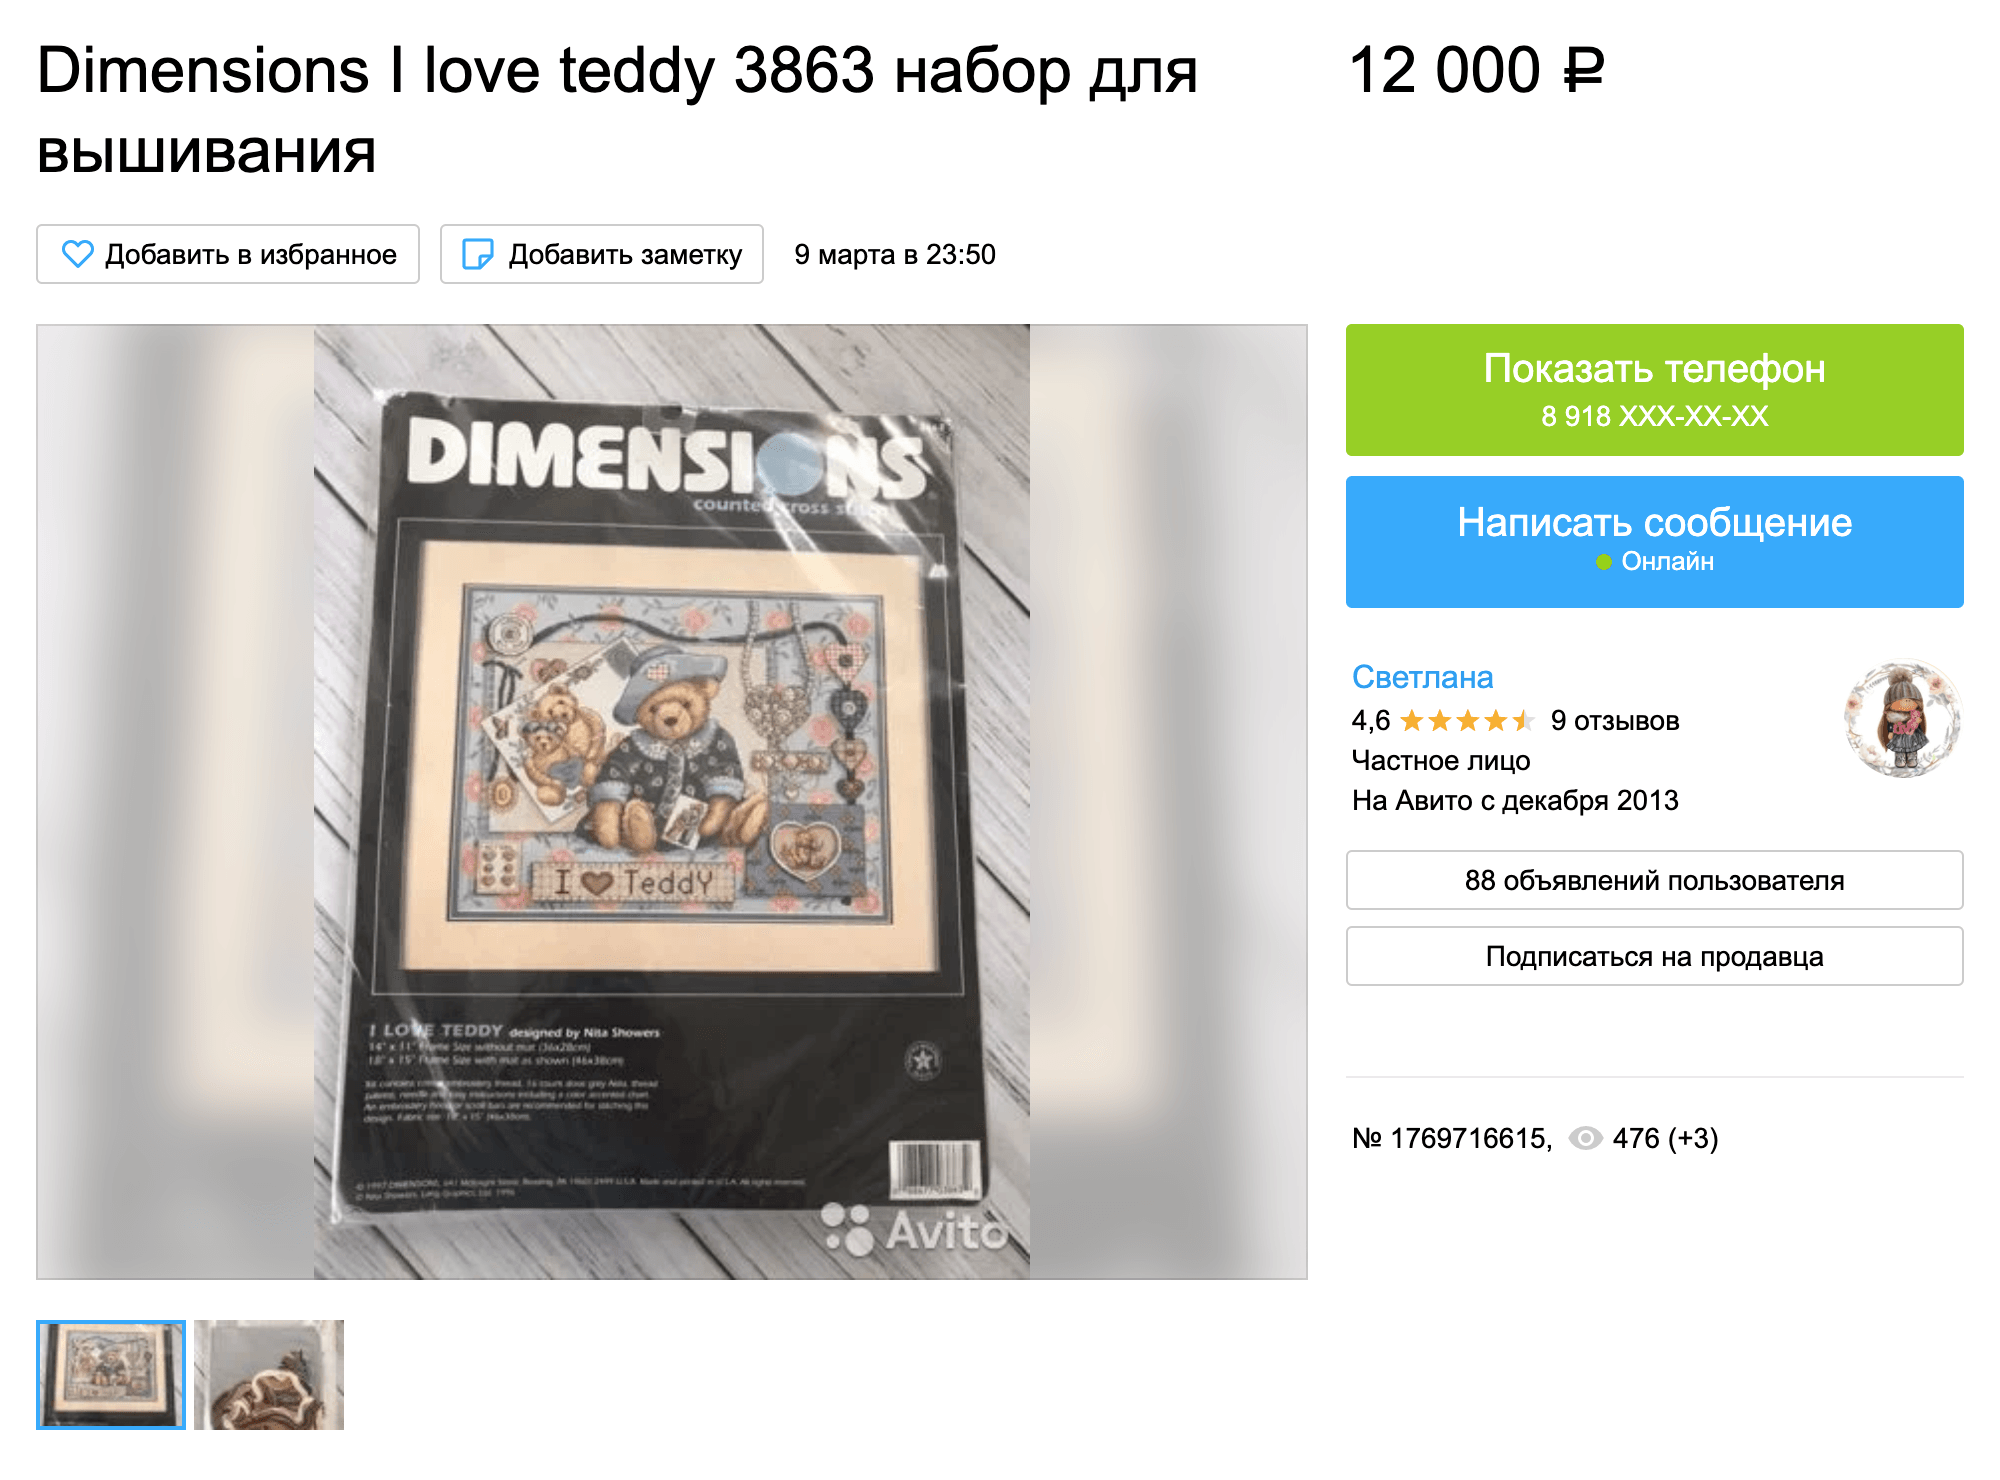 Набор для&nbsp;вышивания Dimensions за 12 000<span class=ruble>Р</span> продают в Краснодаре